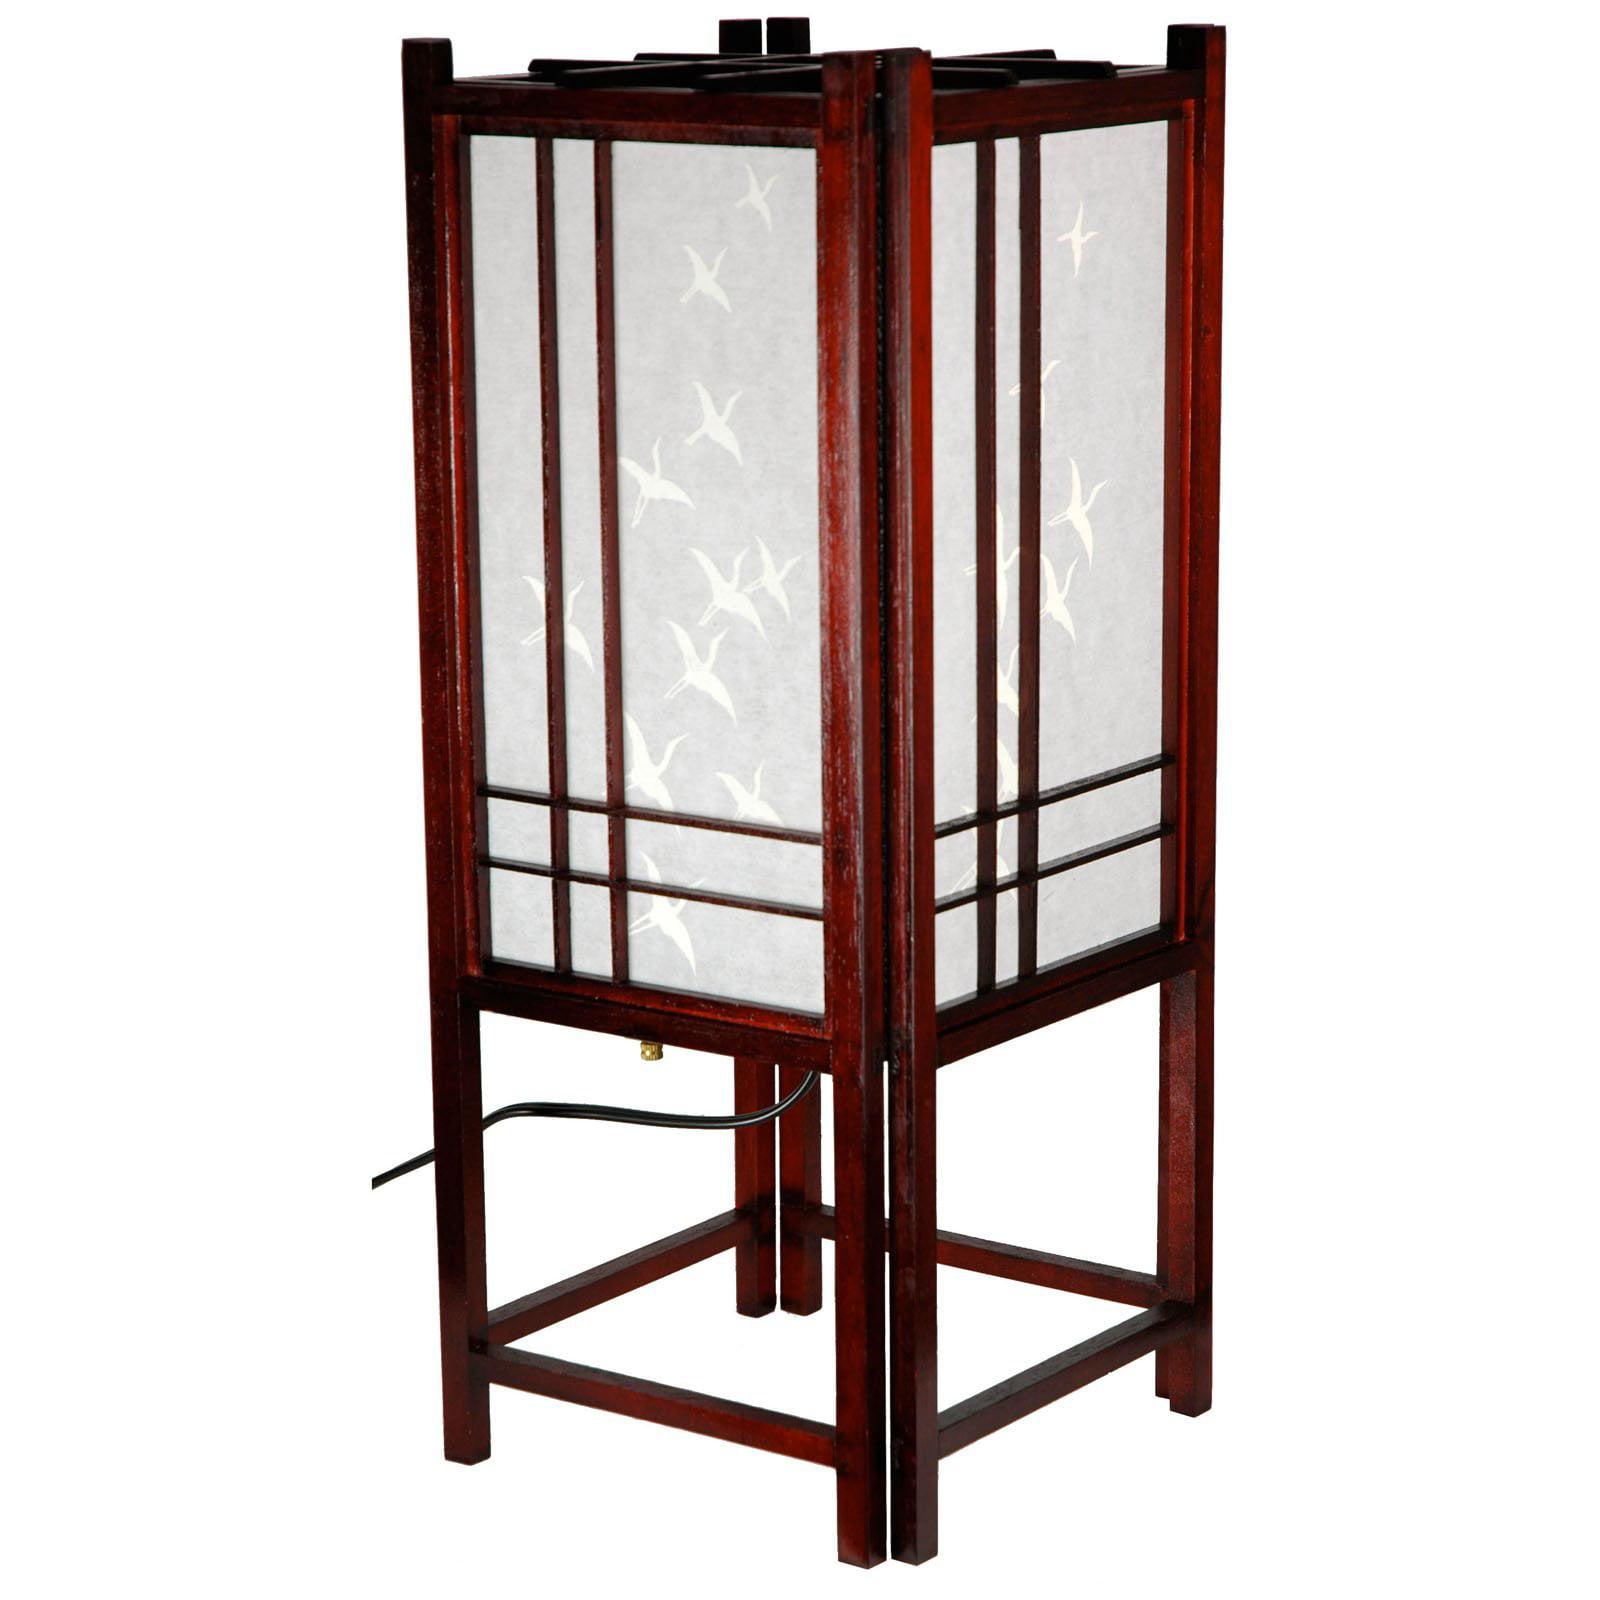 Oriental Furniture Cranes Shoji Lamp 18 Inch   Rosewood   Walmart.com